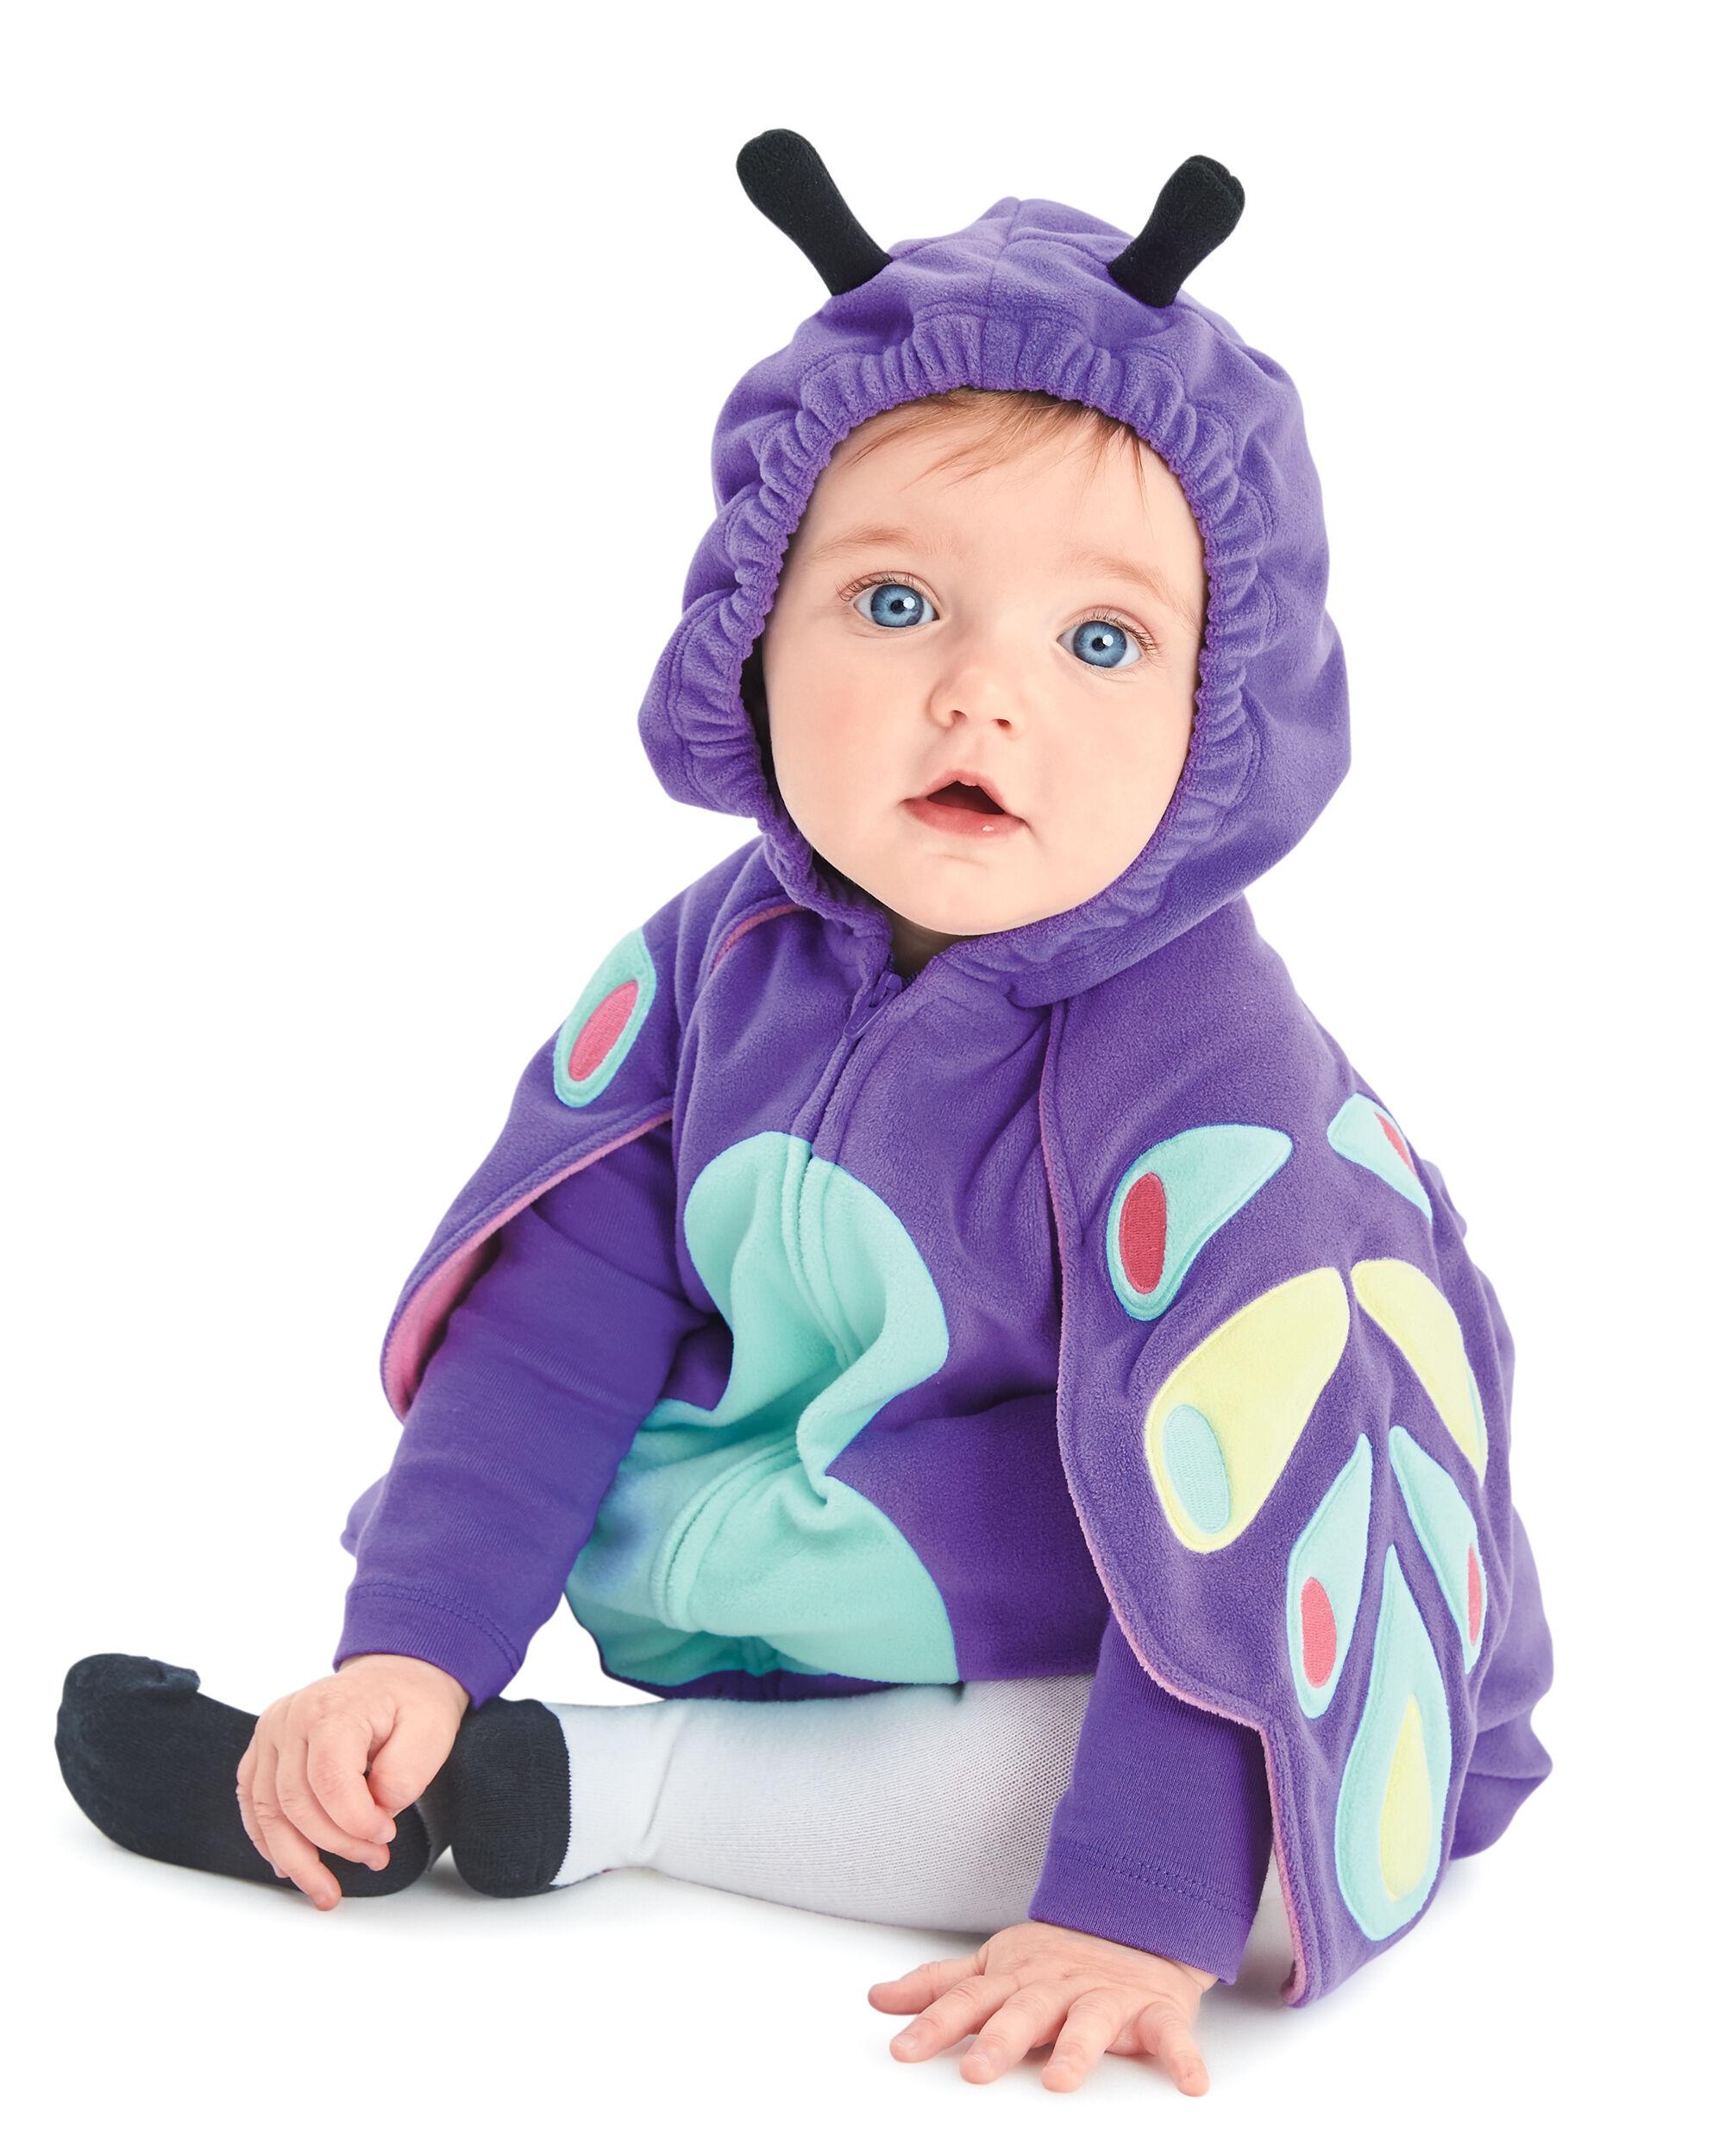 Little Butterfly Halloween Costume | Carters.com